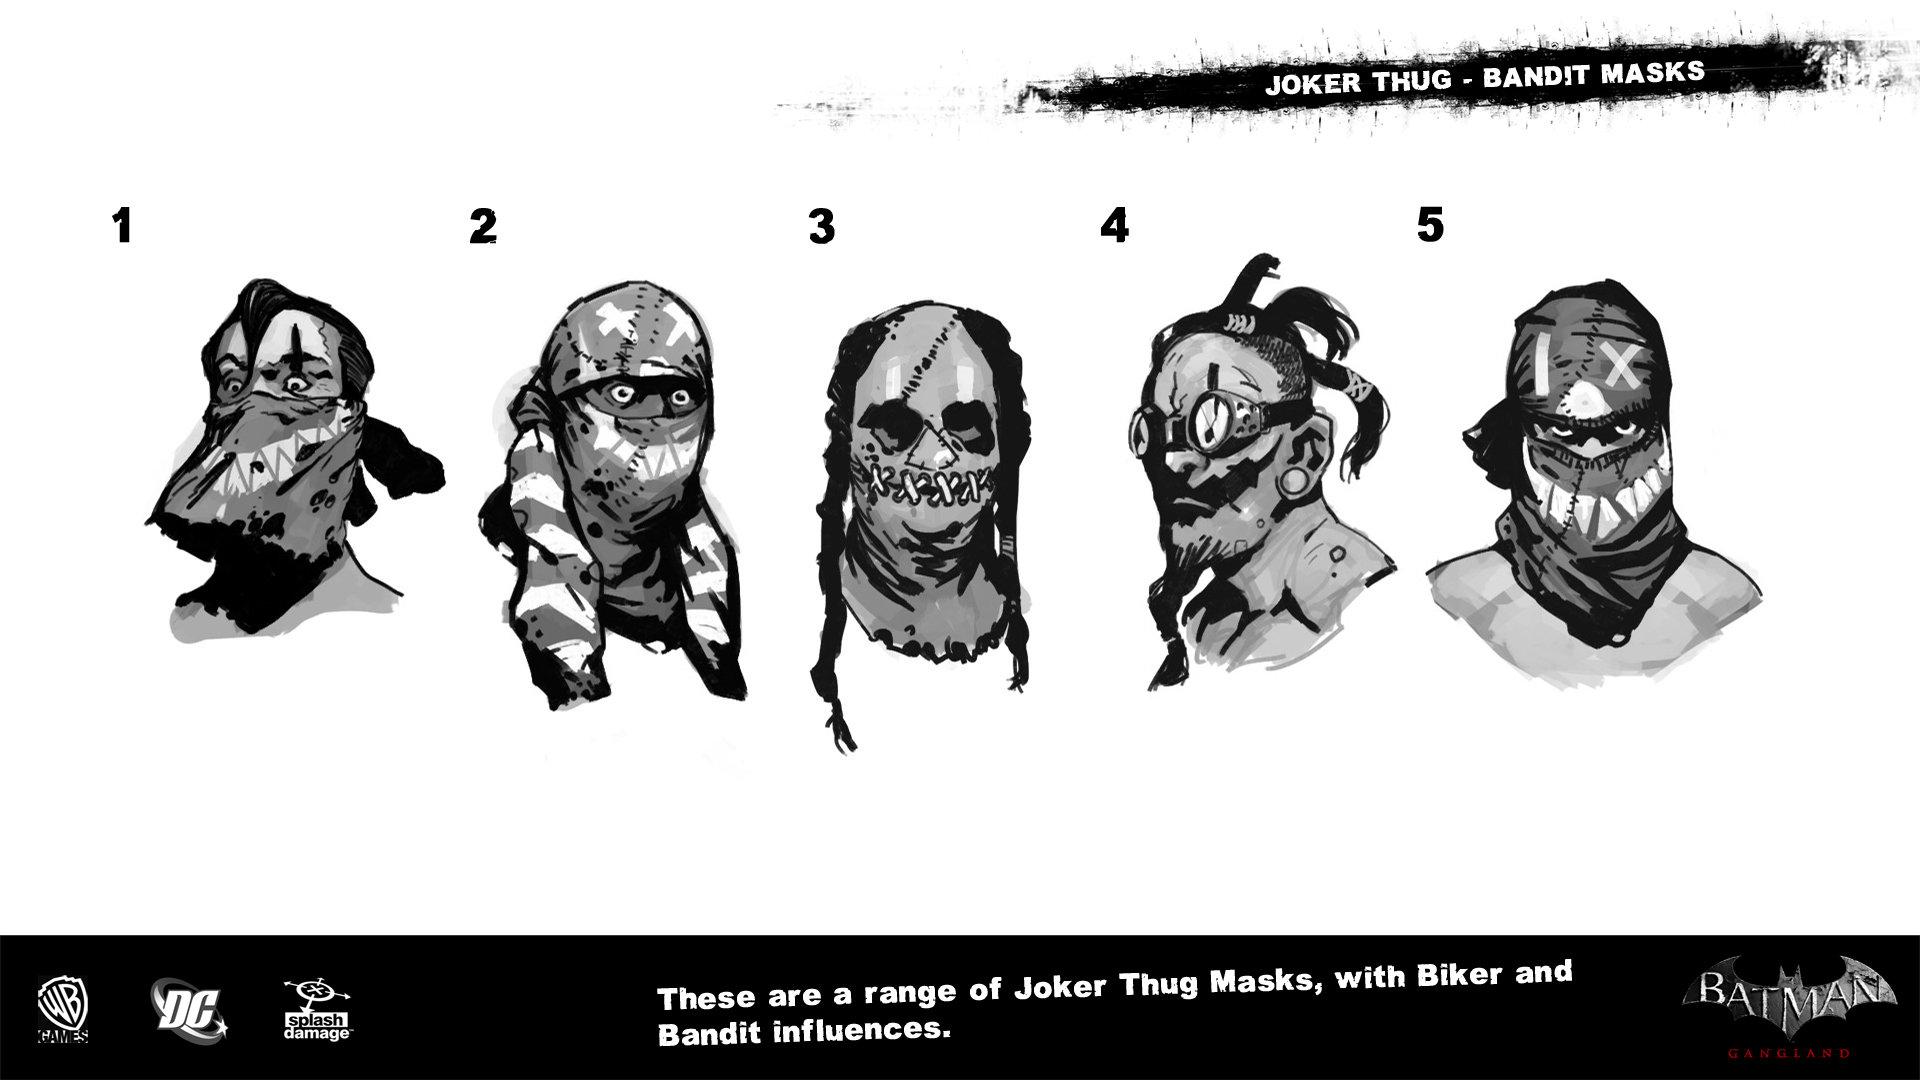 Manuel augusto dischinger moura splashdamage joker thug bandit masks